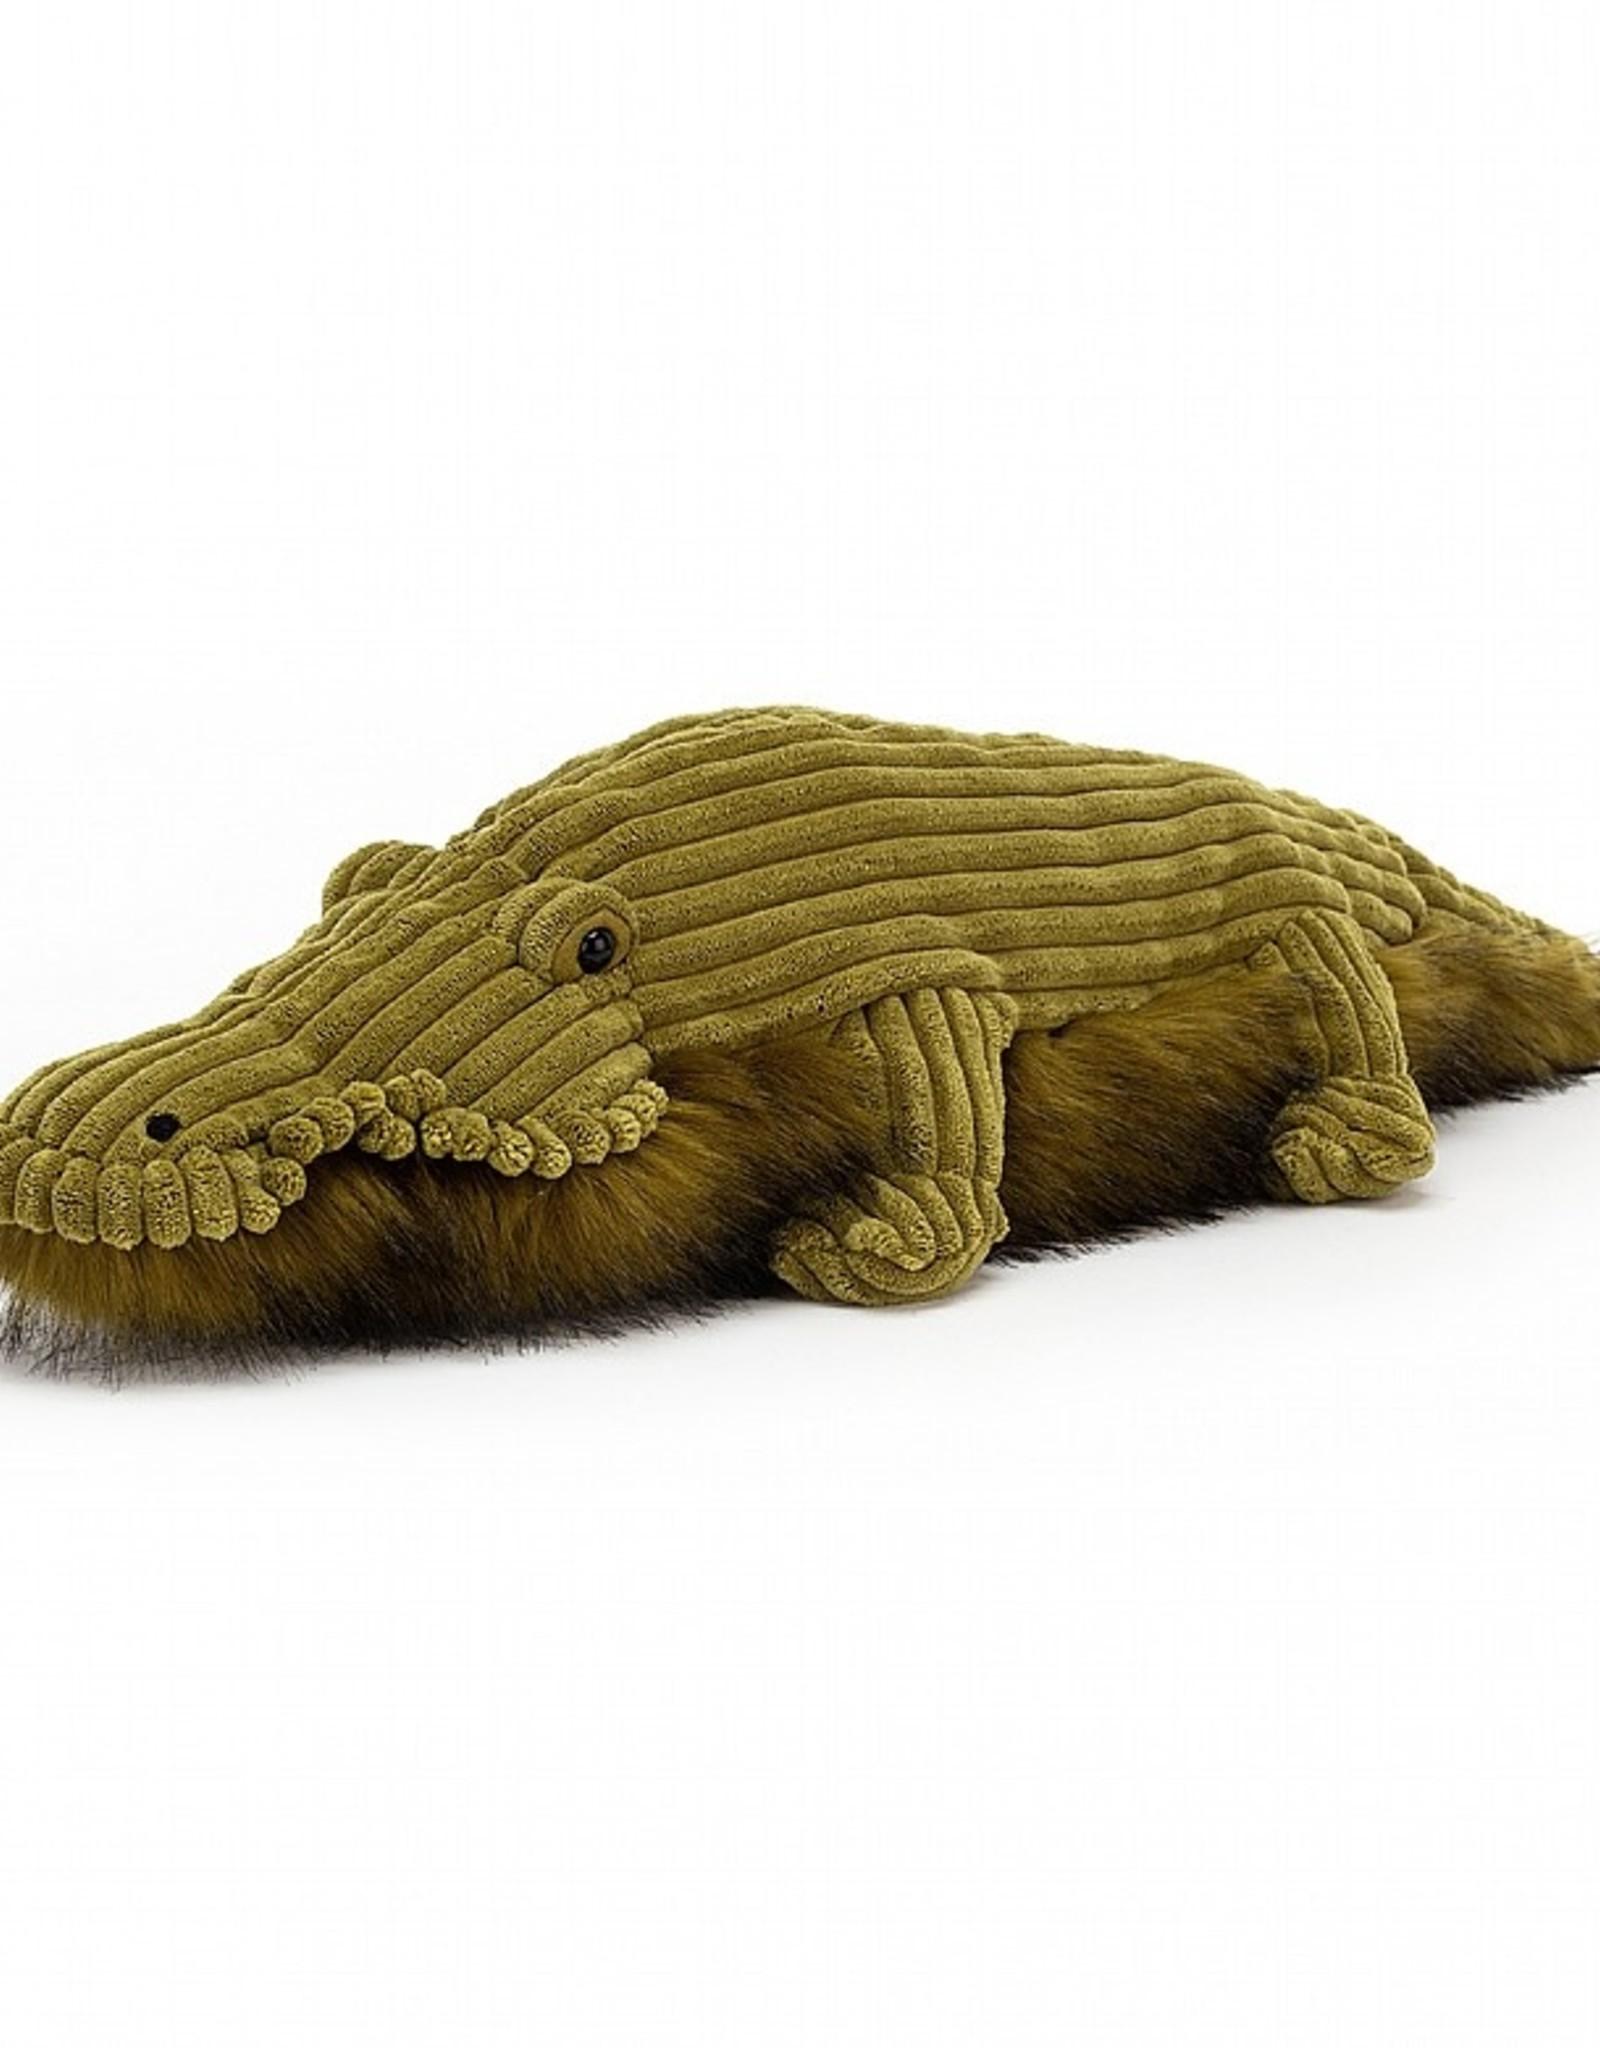 JellyCat Jellycat Wiley Croc